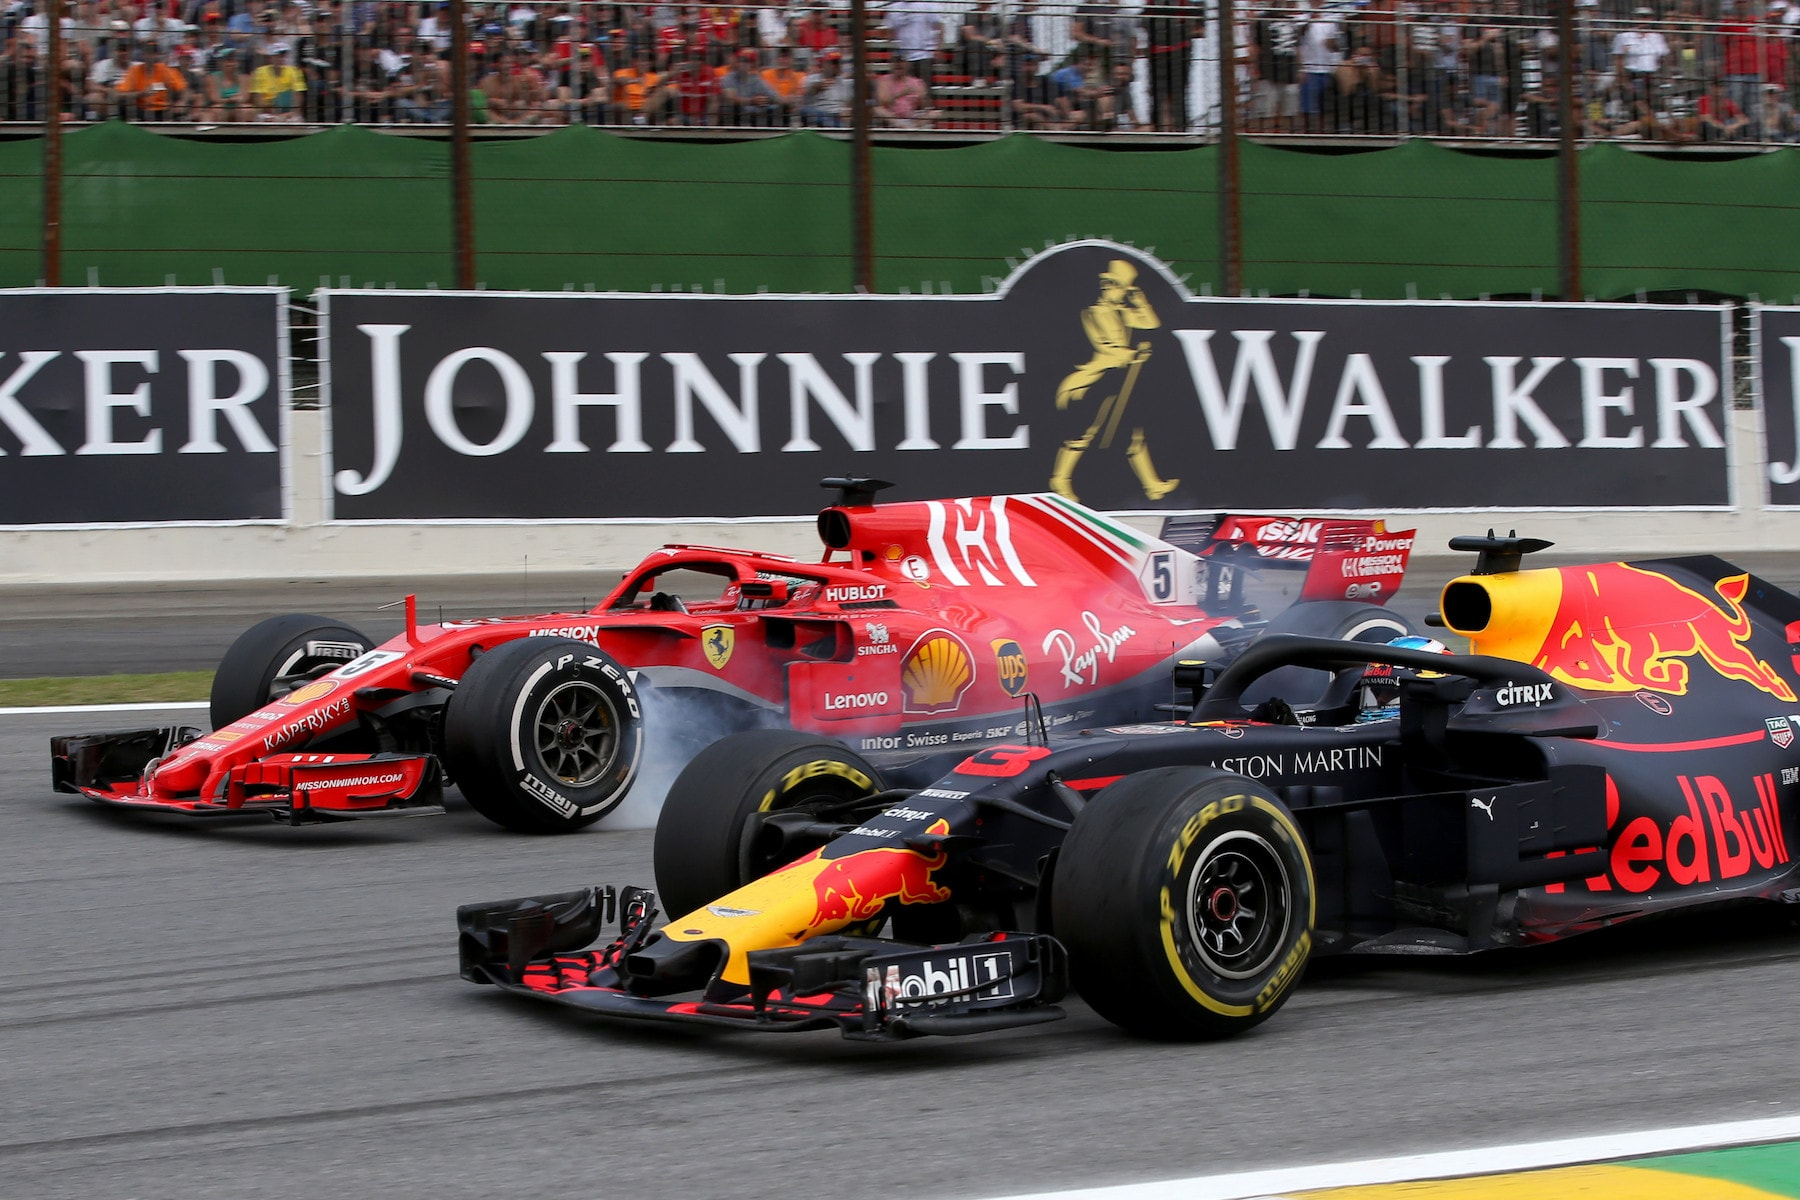 G 2018 Daniel Ricciardo | Red Bull RB14 | 2018 Brazilian GP 1 copy.jpg